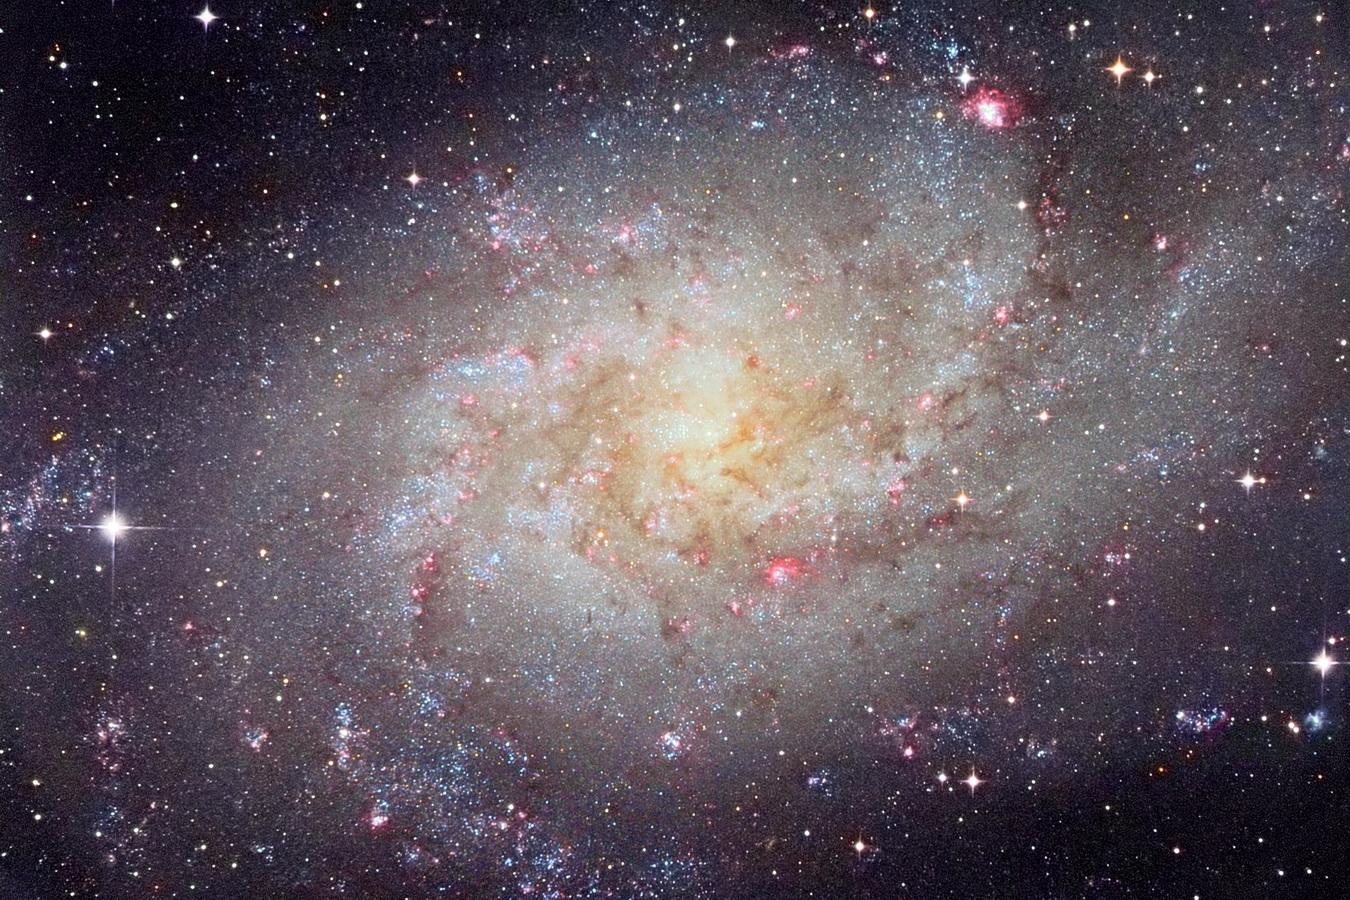 Nebulosa del Triángulo, M33